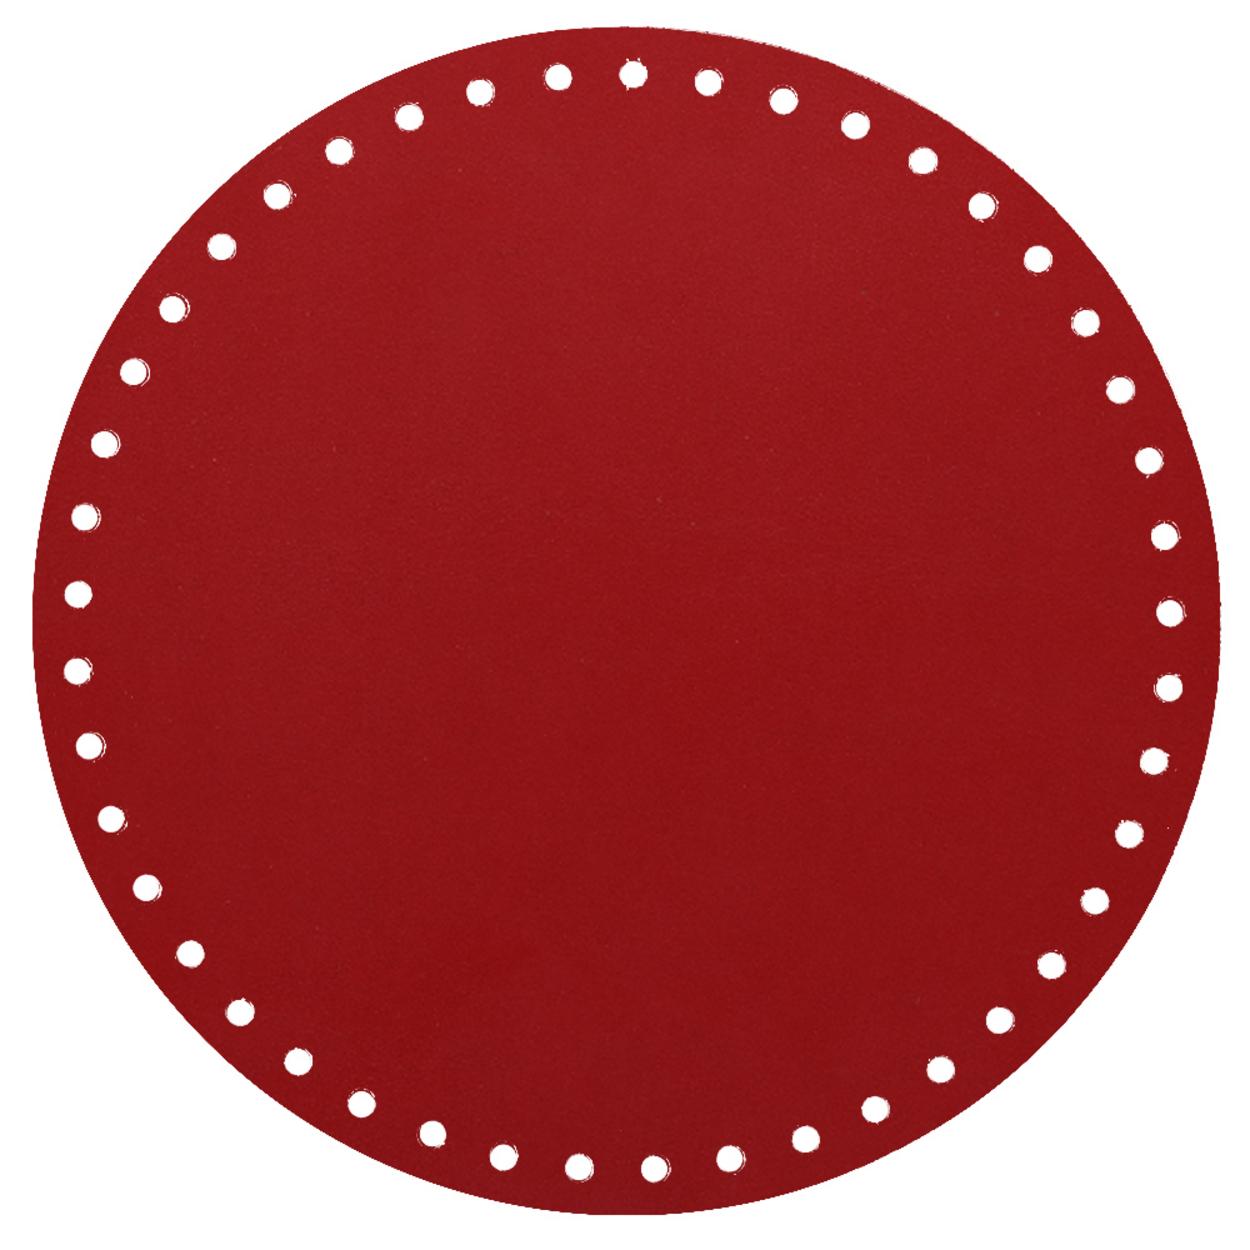 Кожа - Дно для сумки круглое 20 см. Red hot